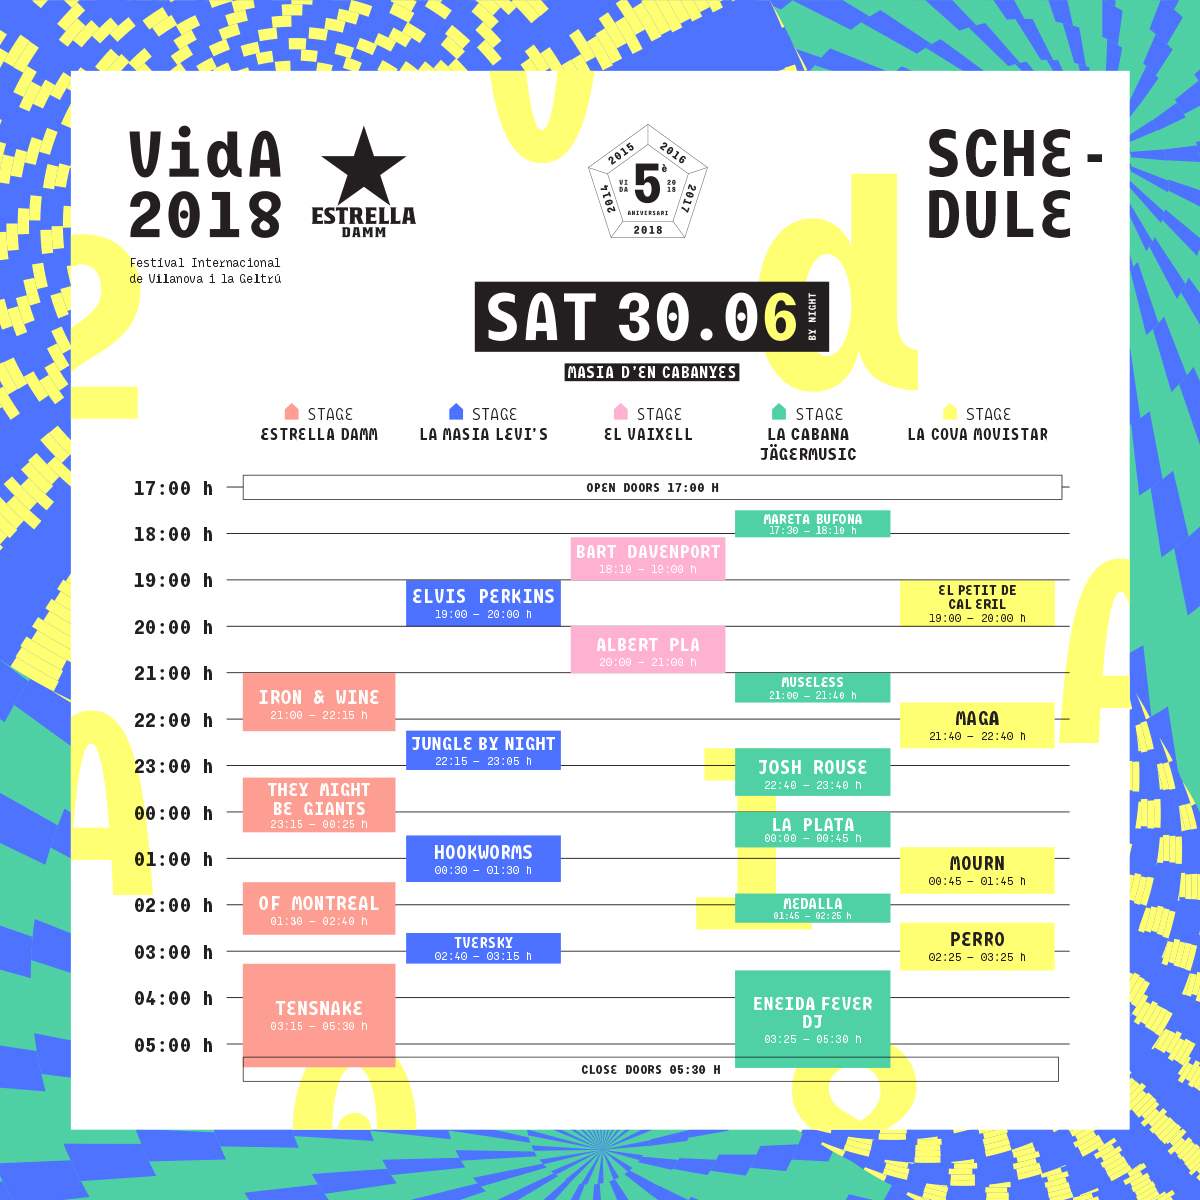 horarios vida festival 2018 sabado